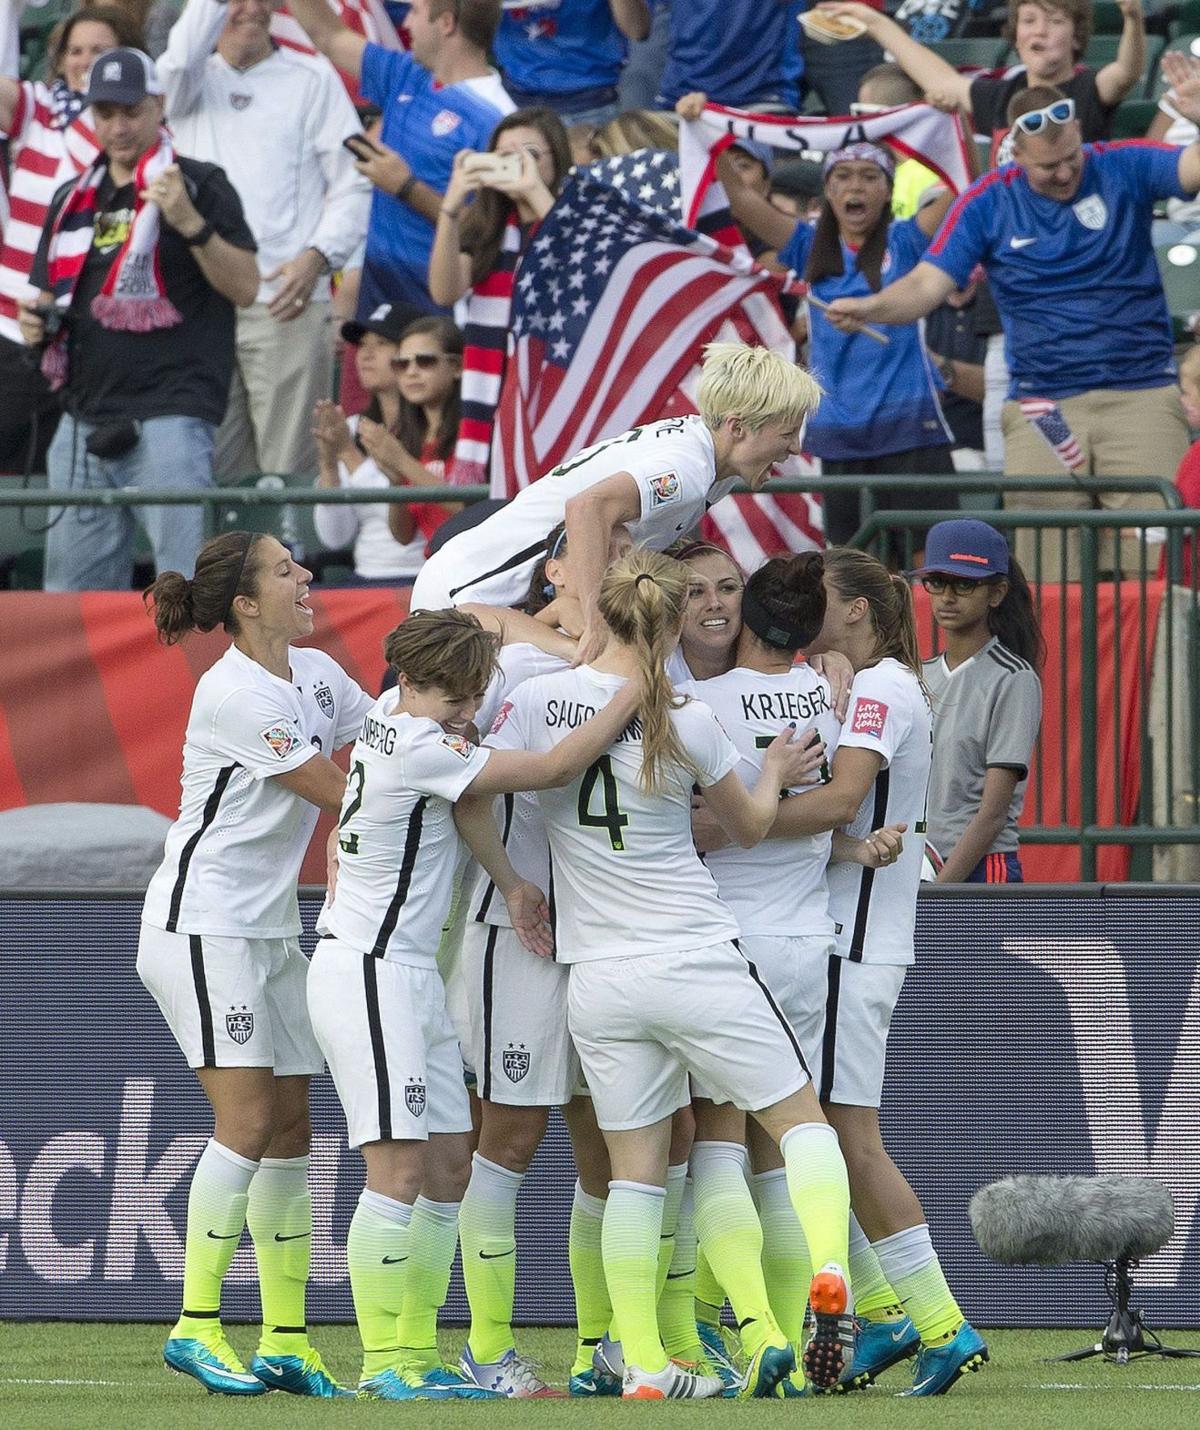 U.S. women march into quarterfinals